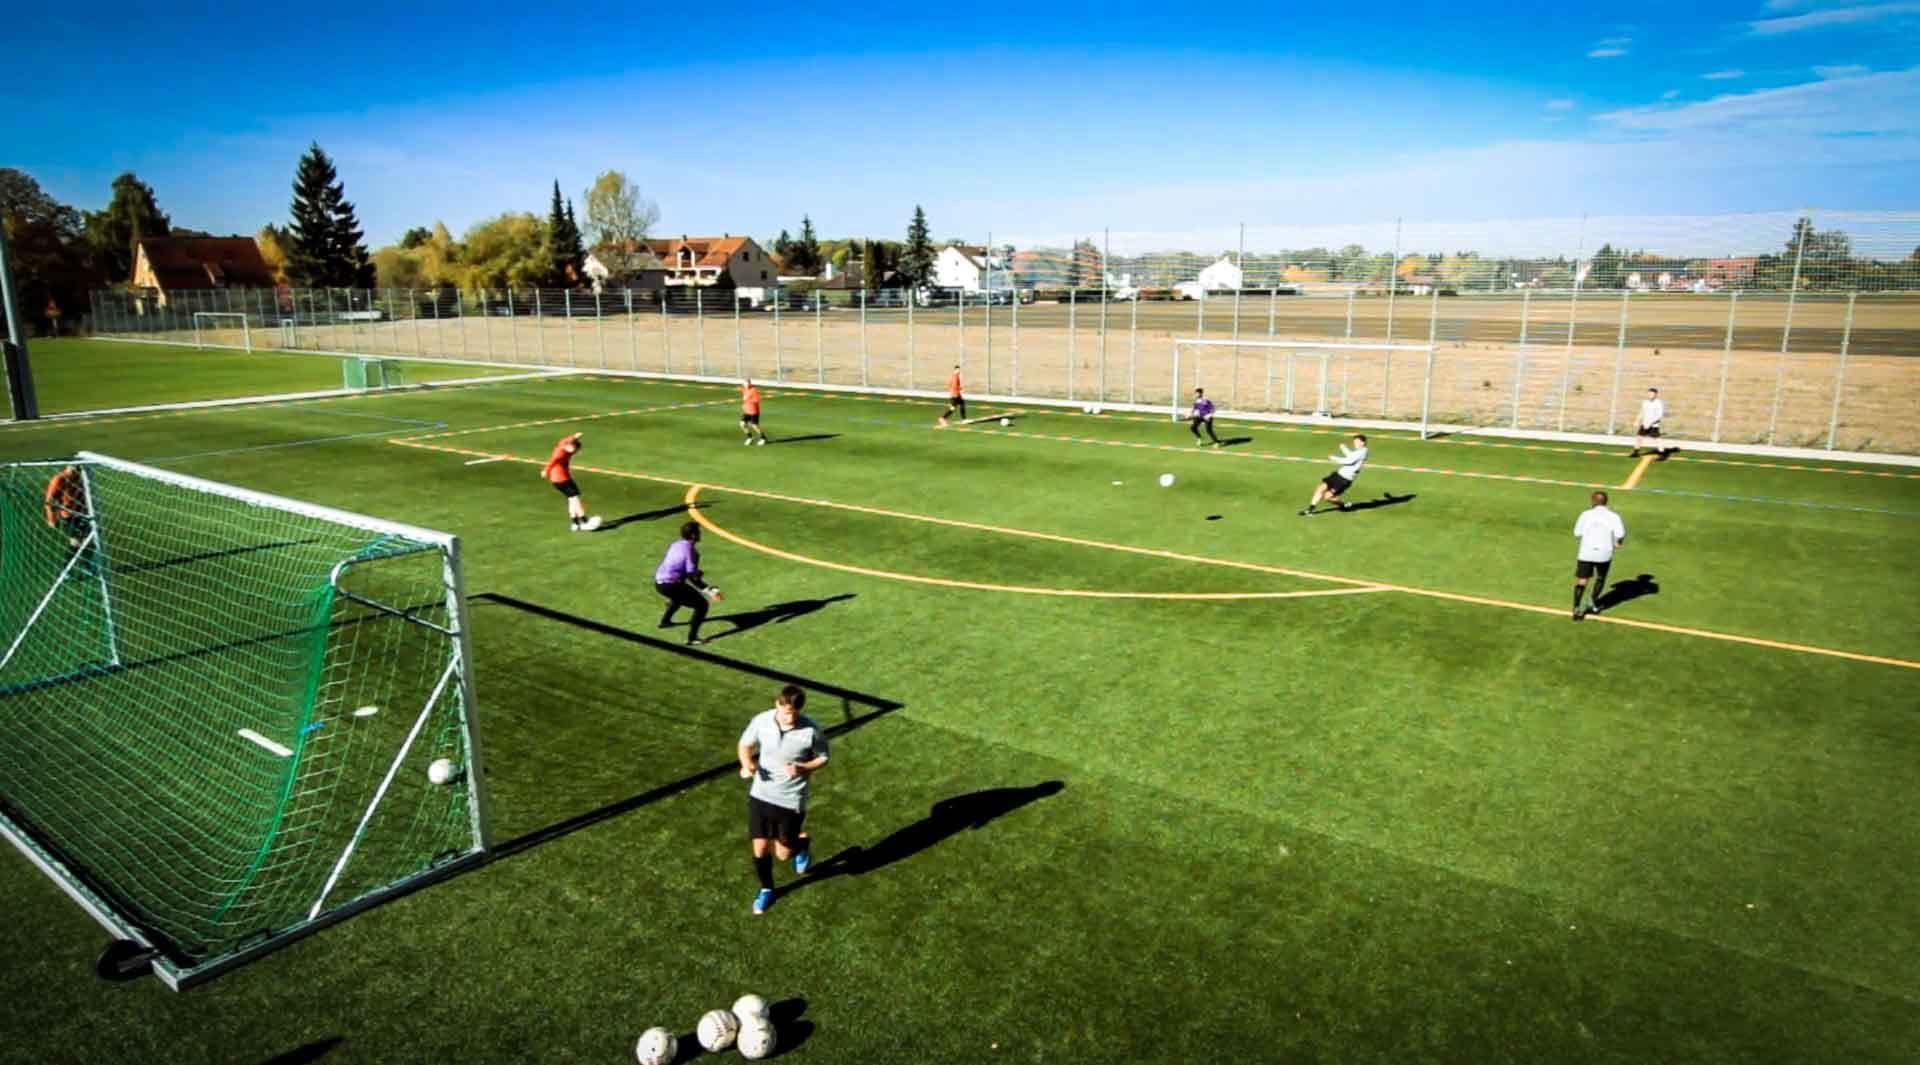 Fussballtraining Playlist 6 Balle Tore